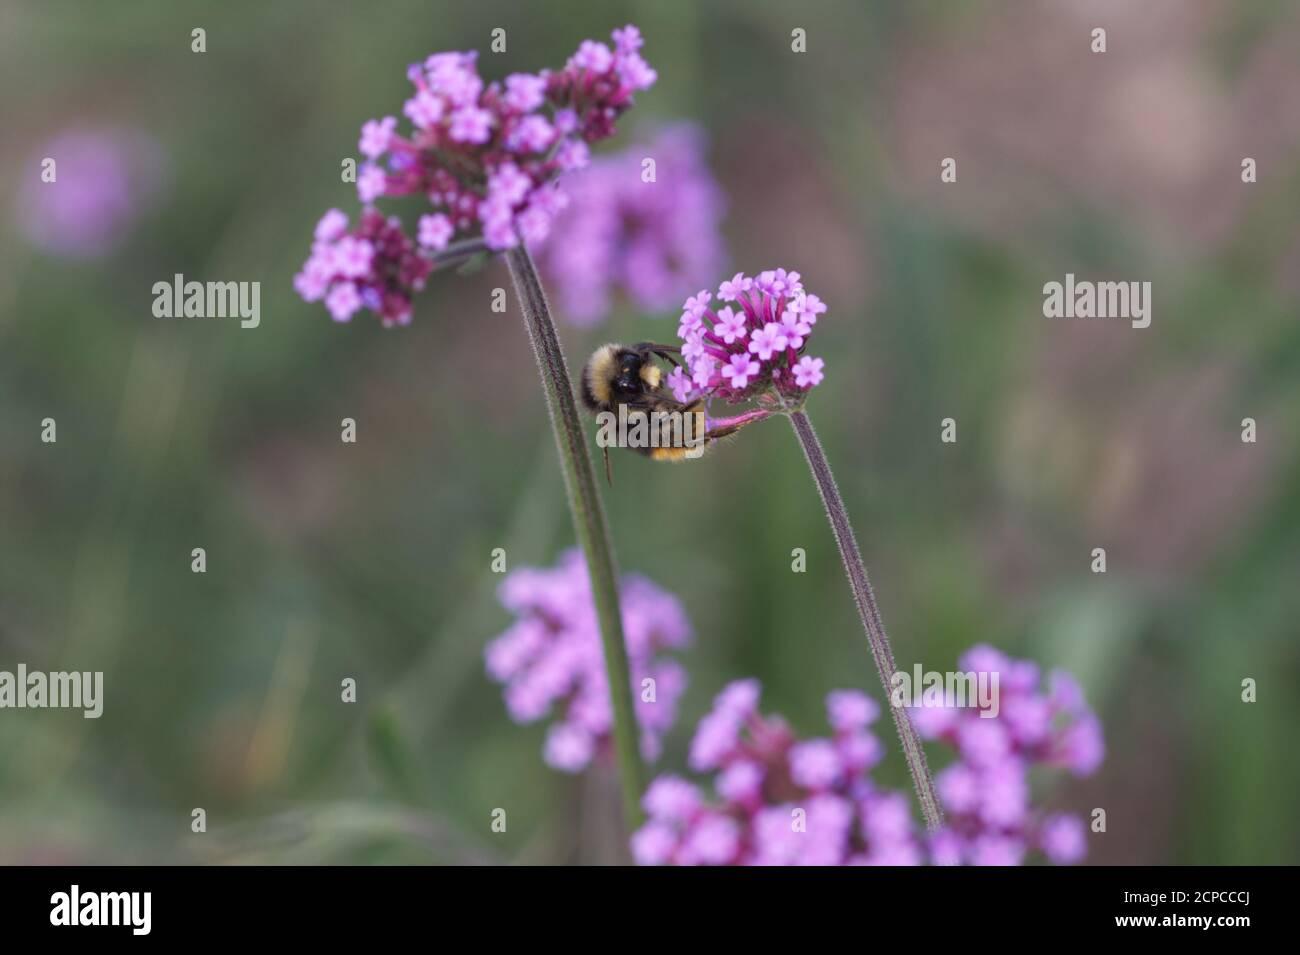 Bumblebee on flower of Verbena bonariensis Stock Photo